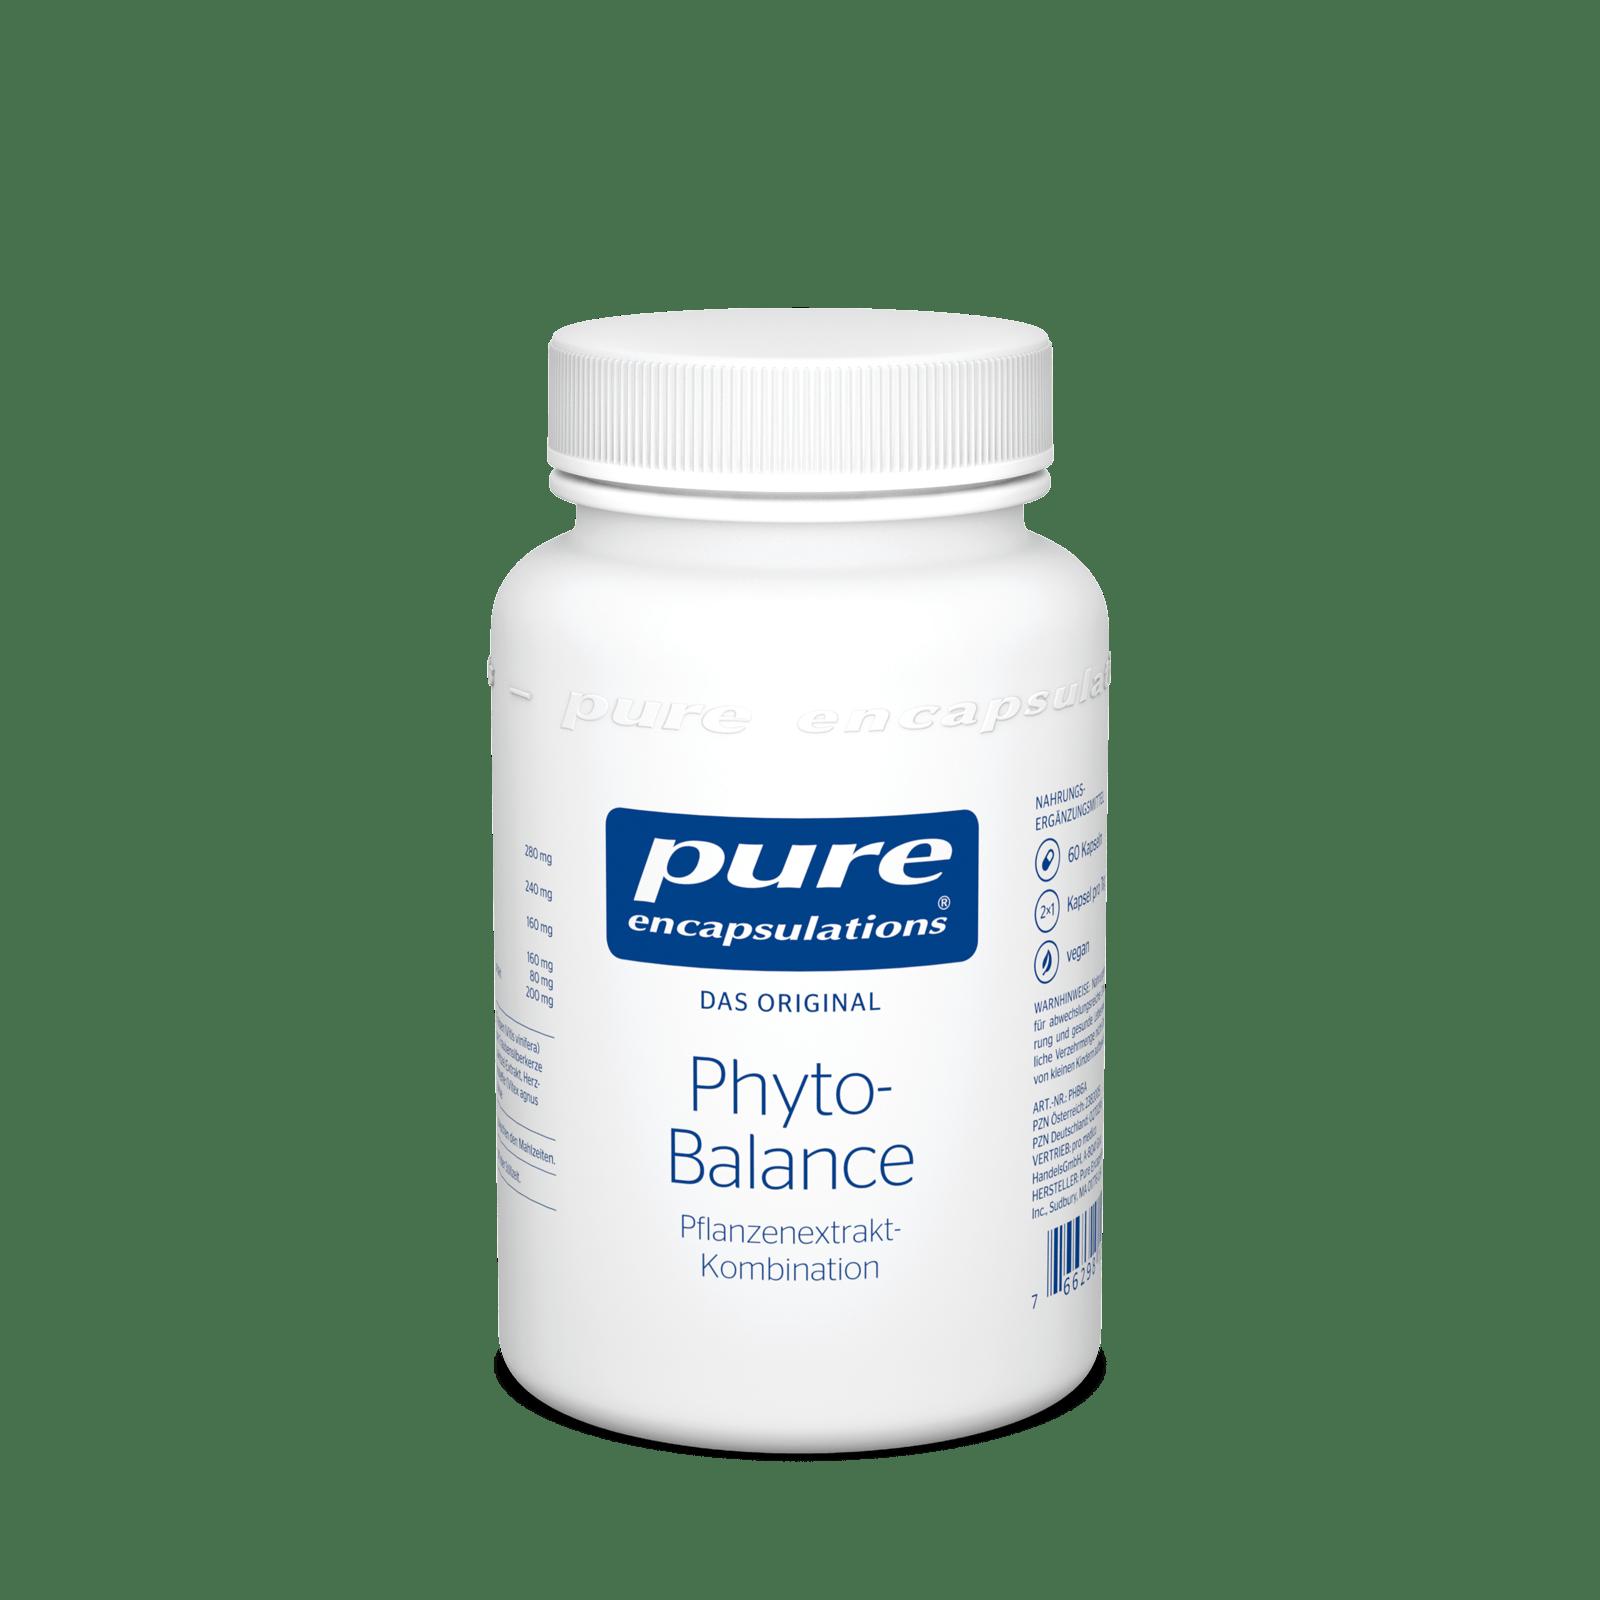 Phyto Balance